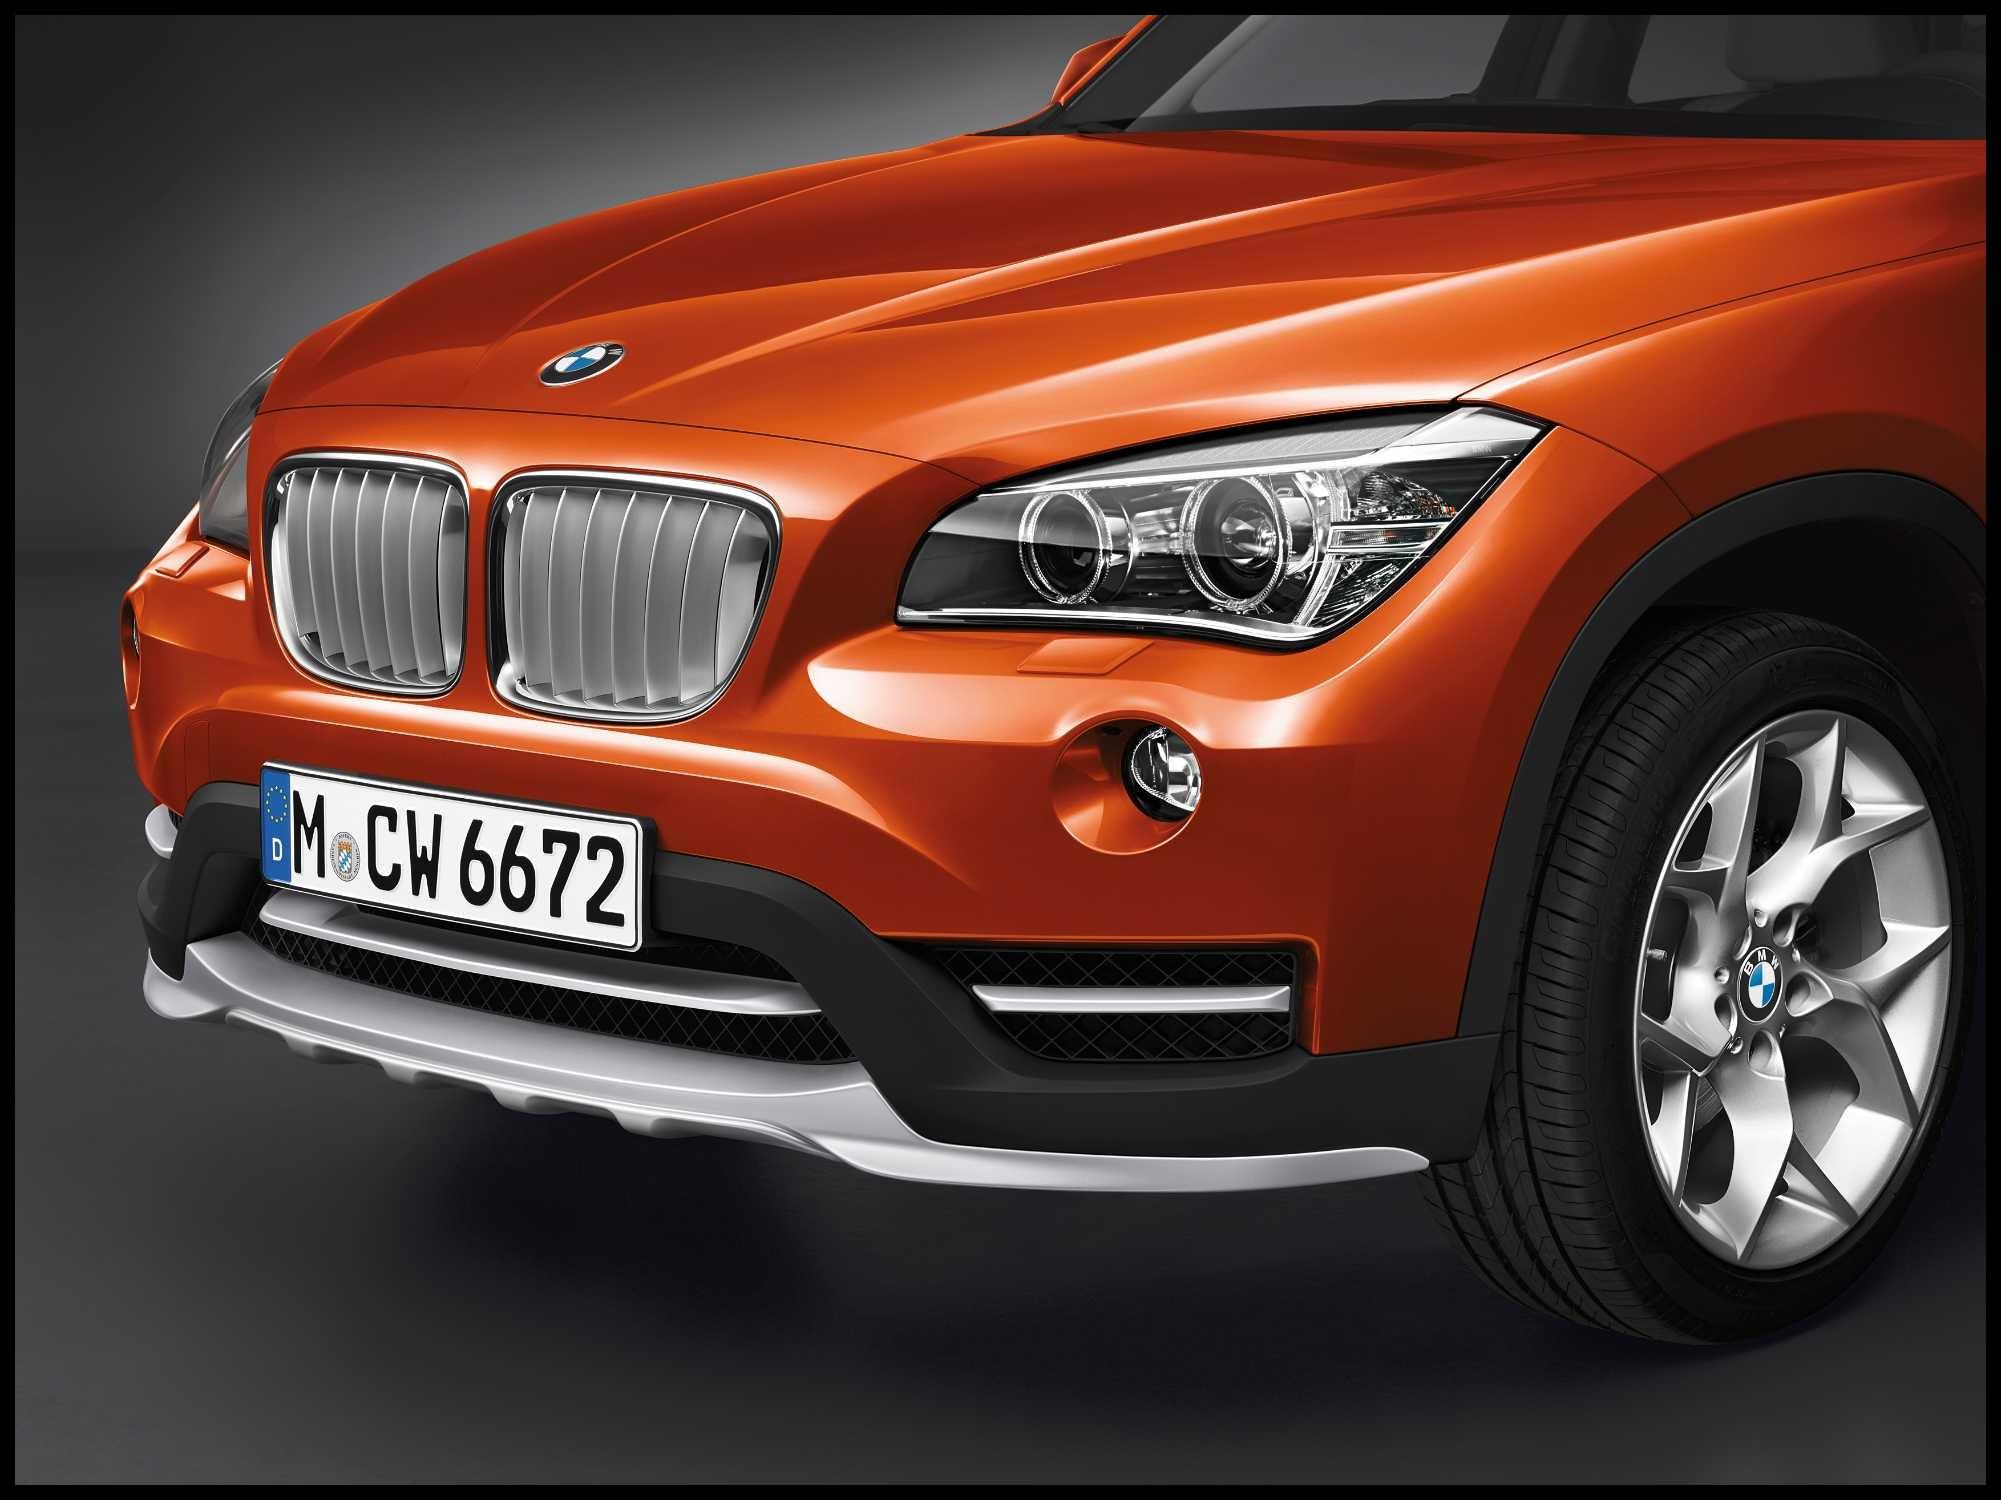 BMW X1 xDrive25d Valencia Orange metallic Light alloy wheels Y spoke 322 xLine 12 2013